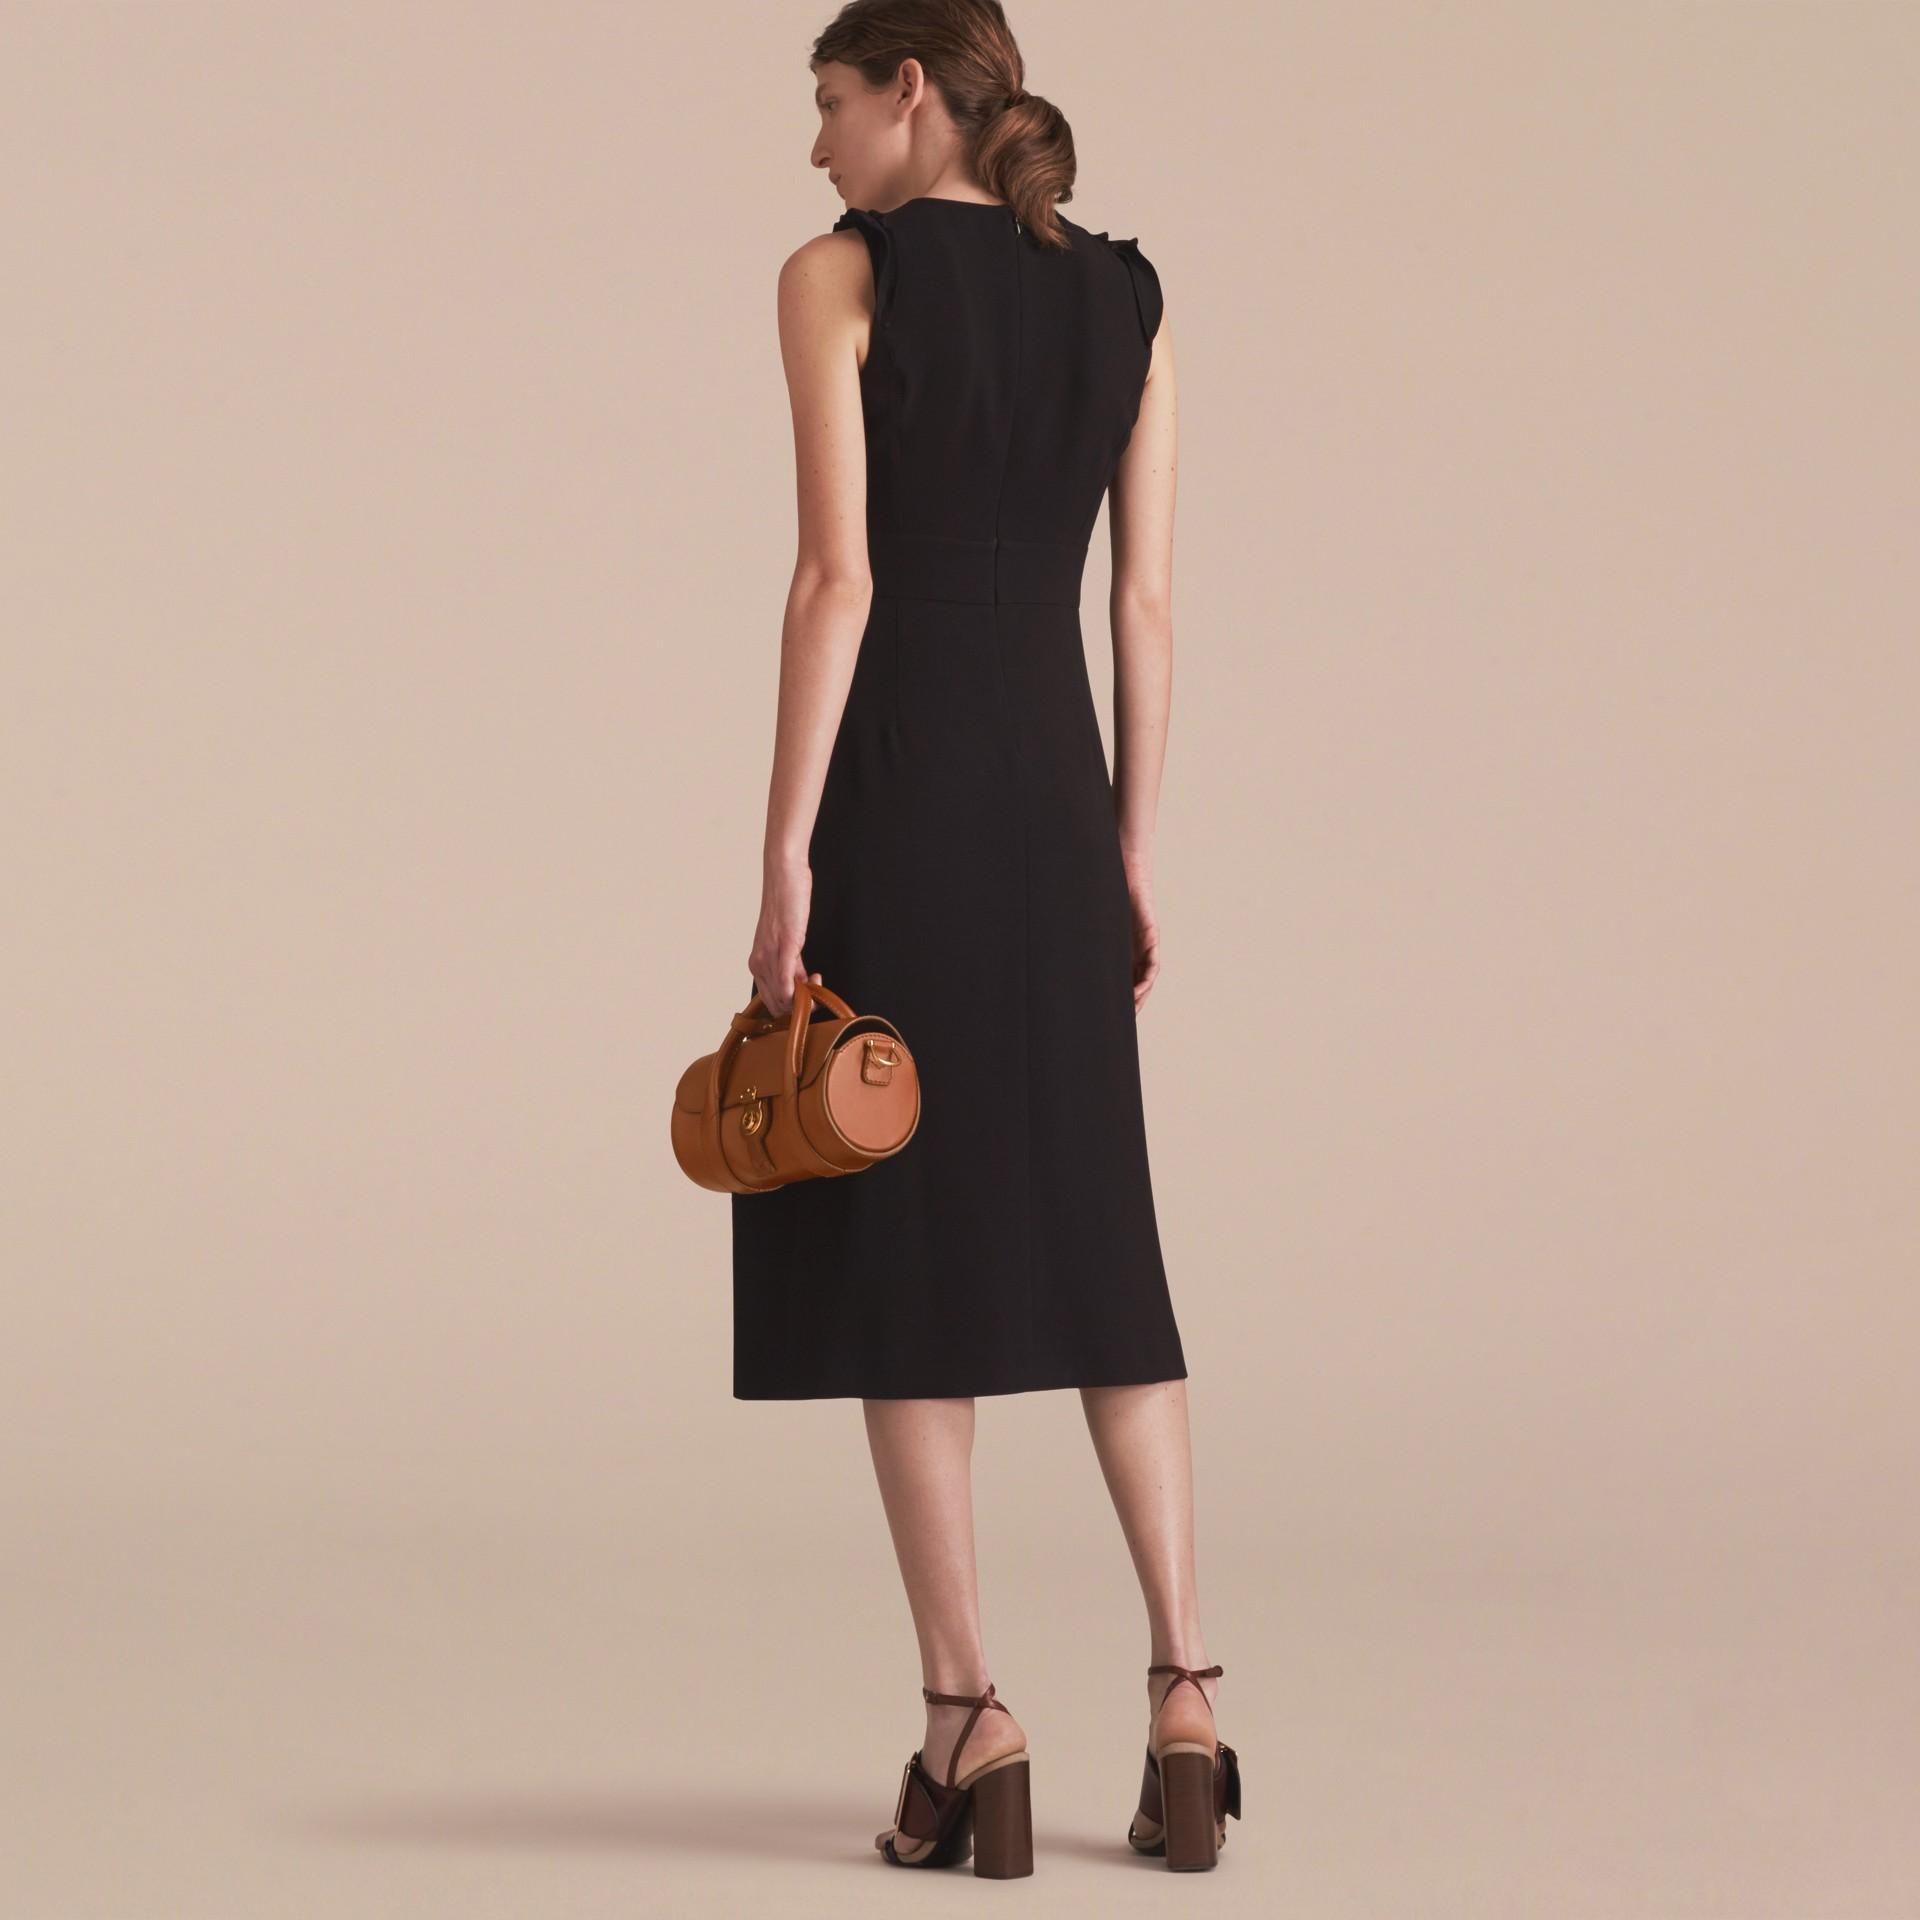 Sleeveless Ruffle Trim Crepe Dress - gallery image 3